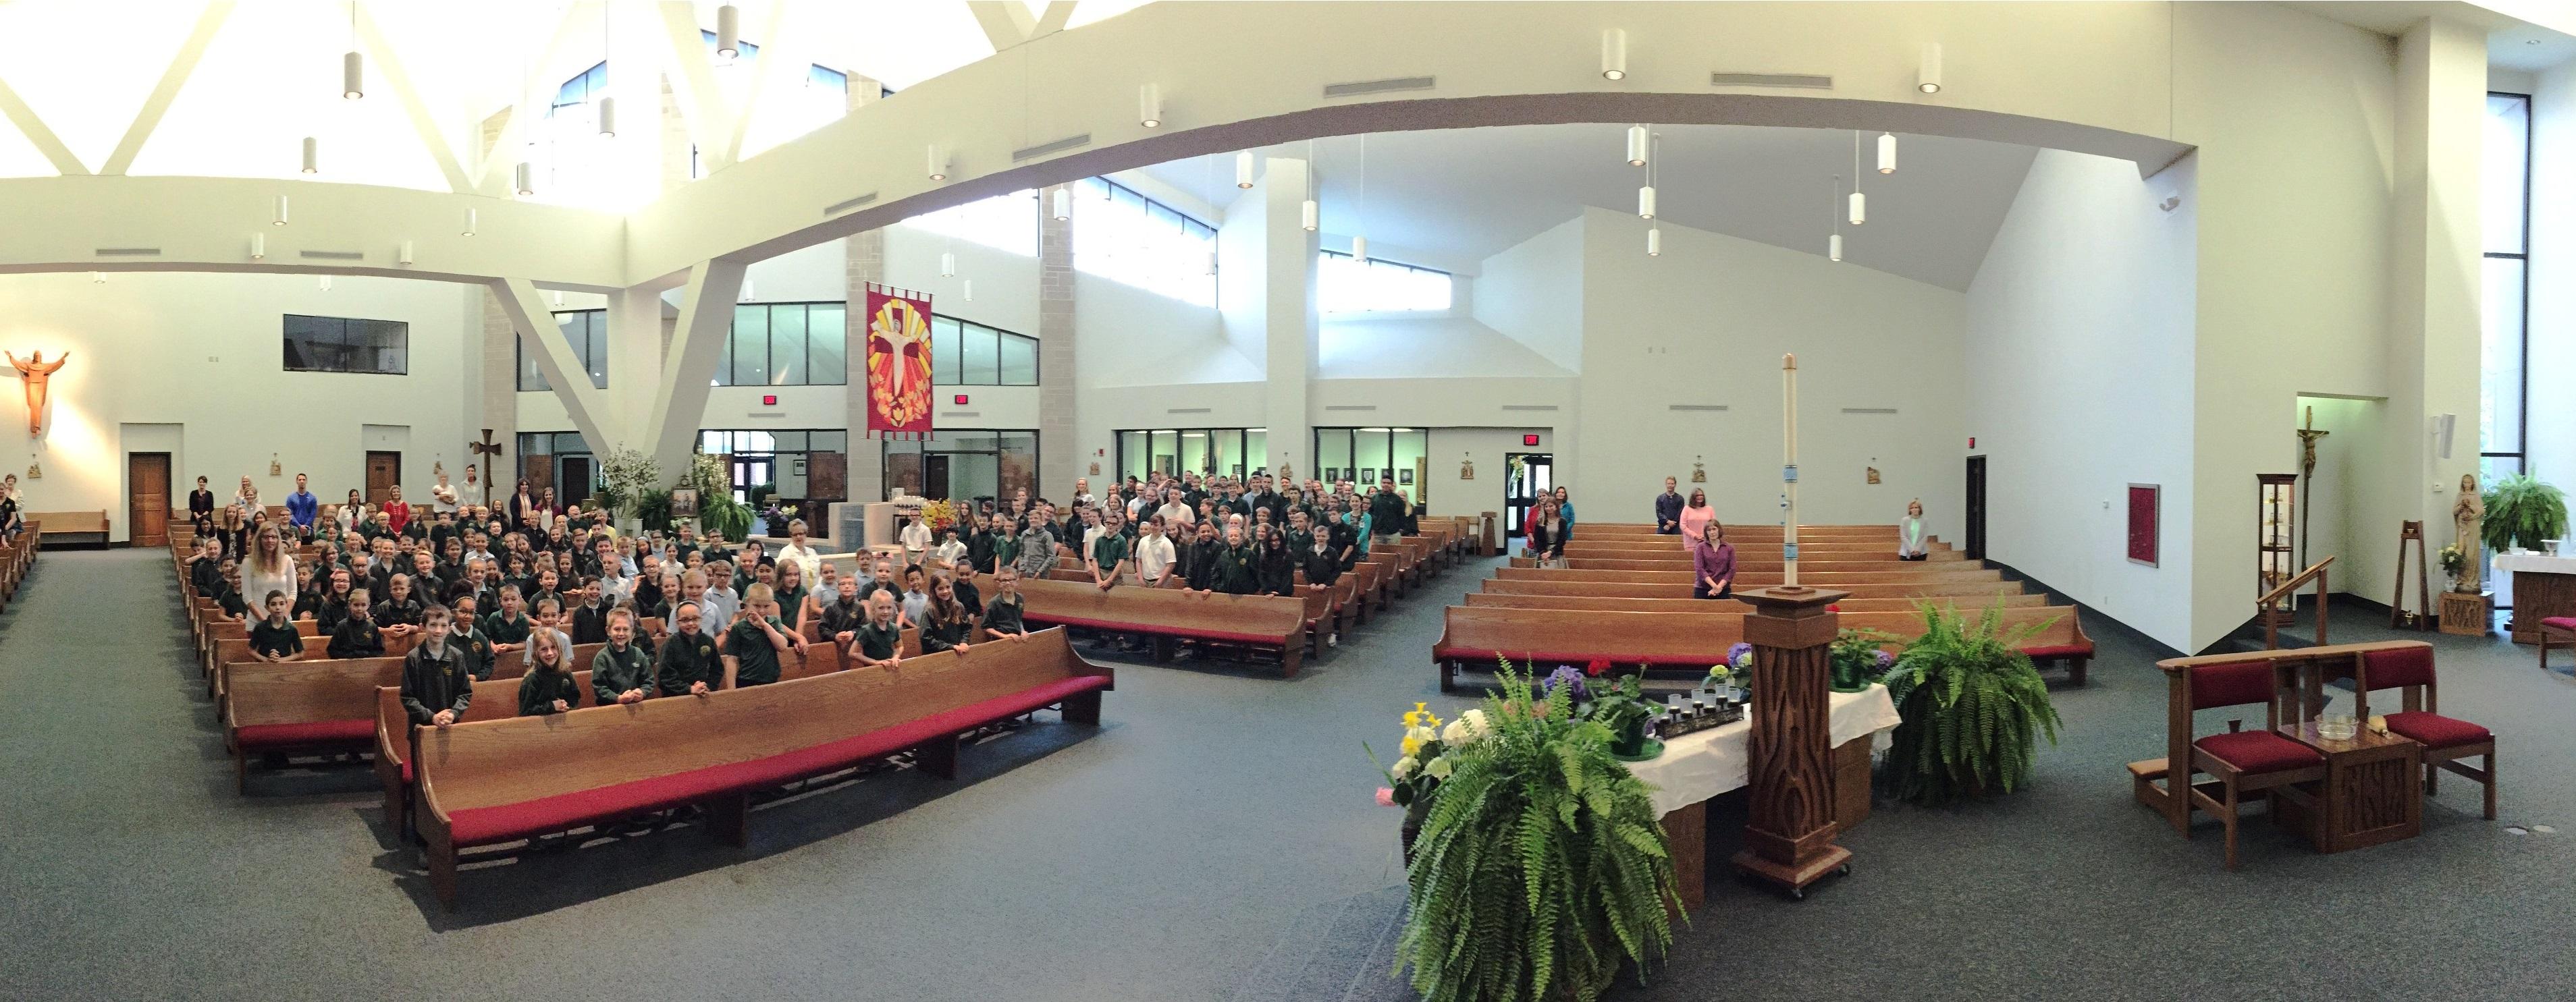 Good shepherd funeral home rome ga - Welcome To Our Parish Good Shepherd Catholic Parish